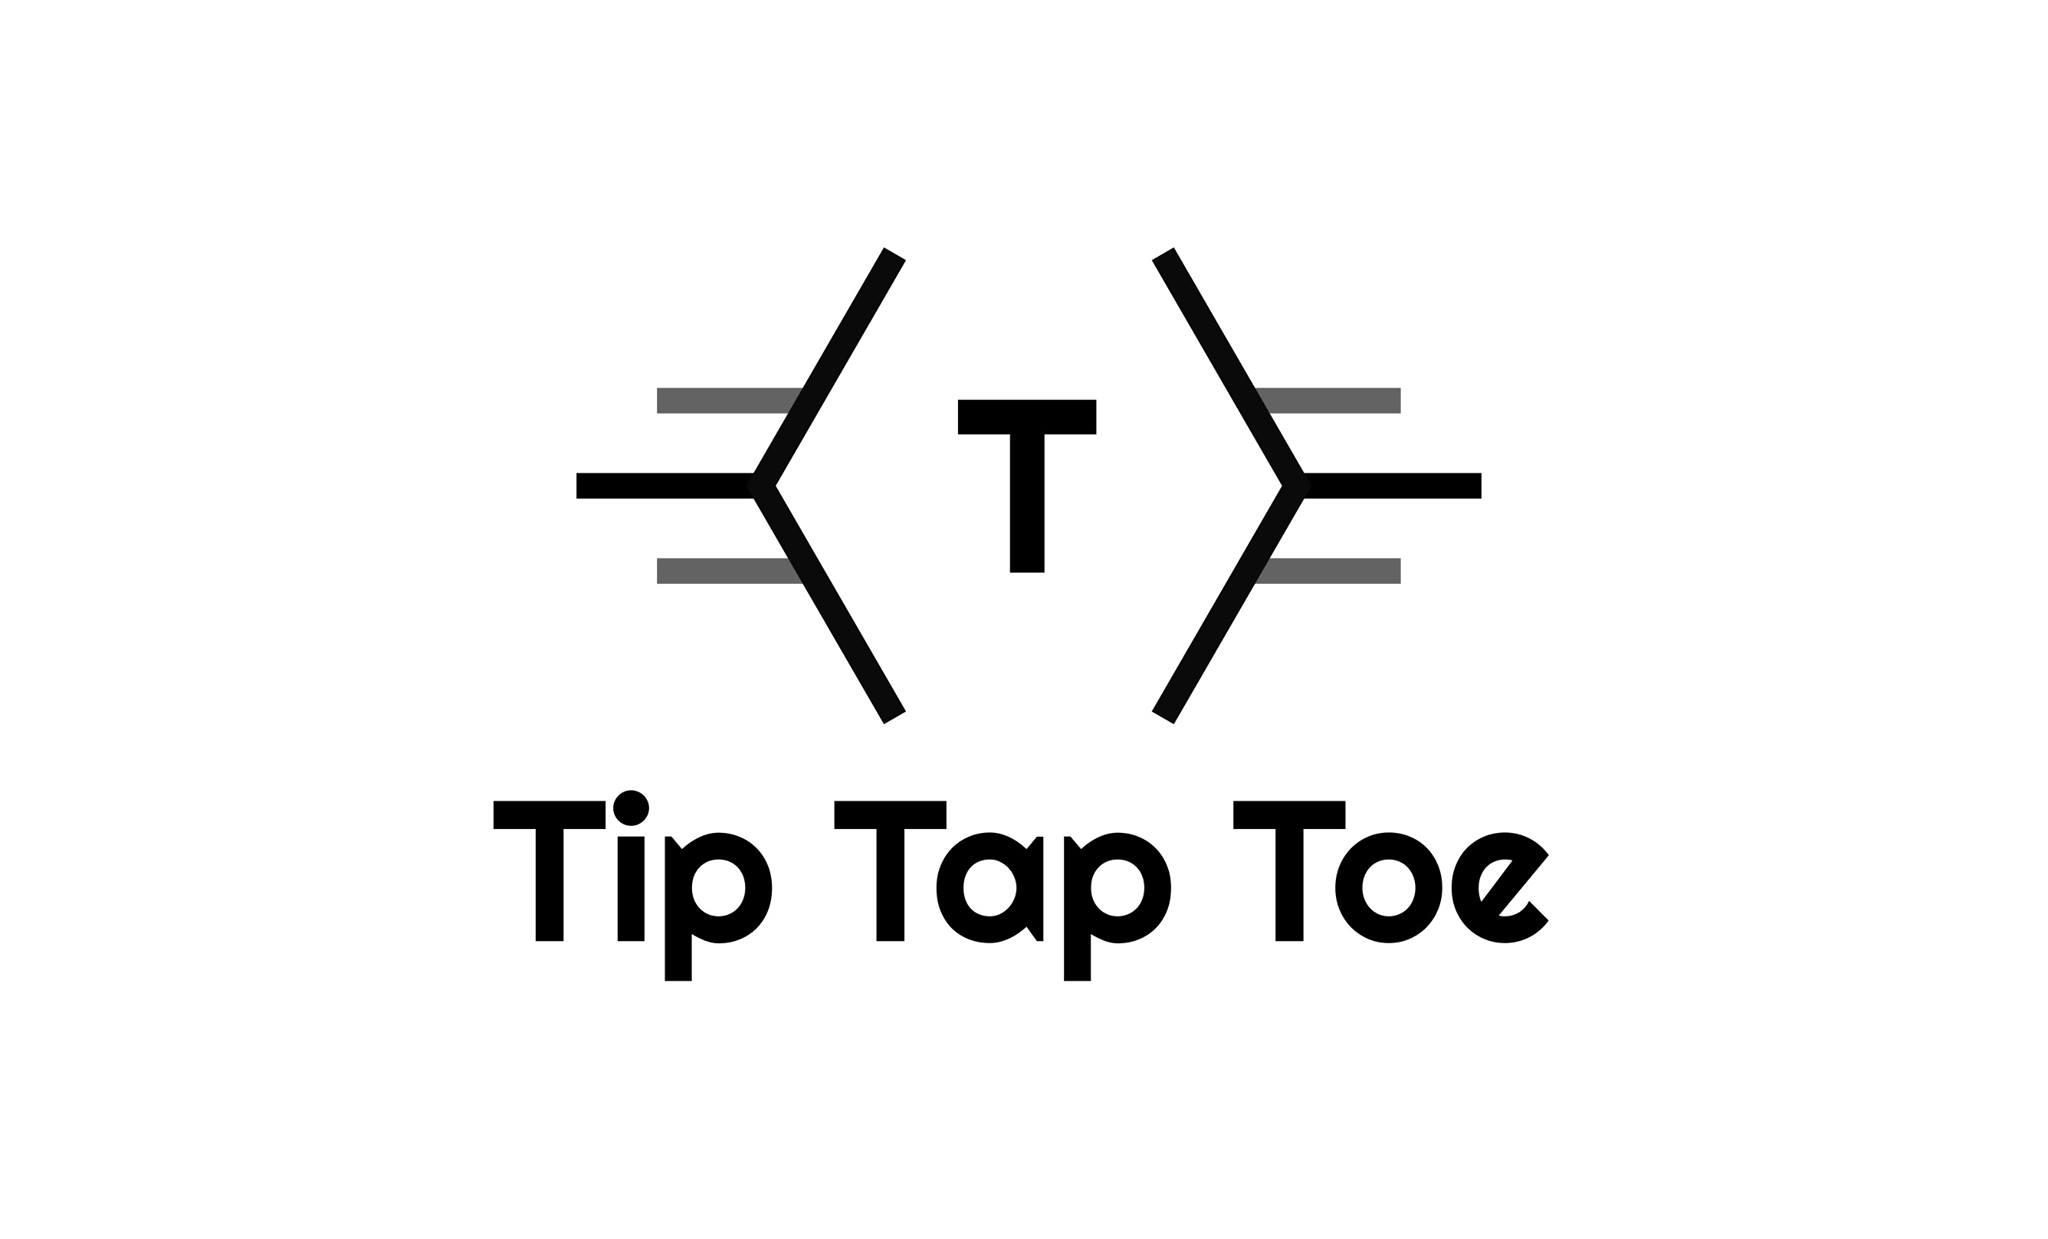 Tip Tap Toe